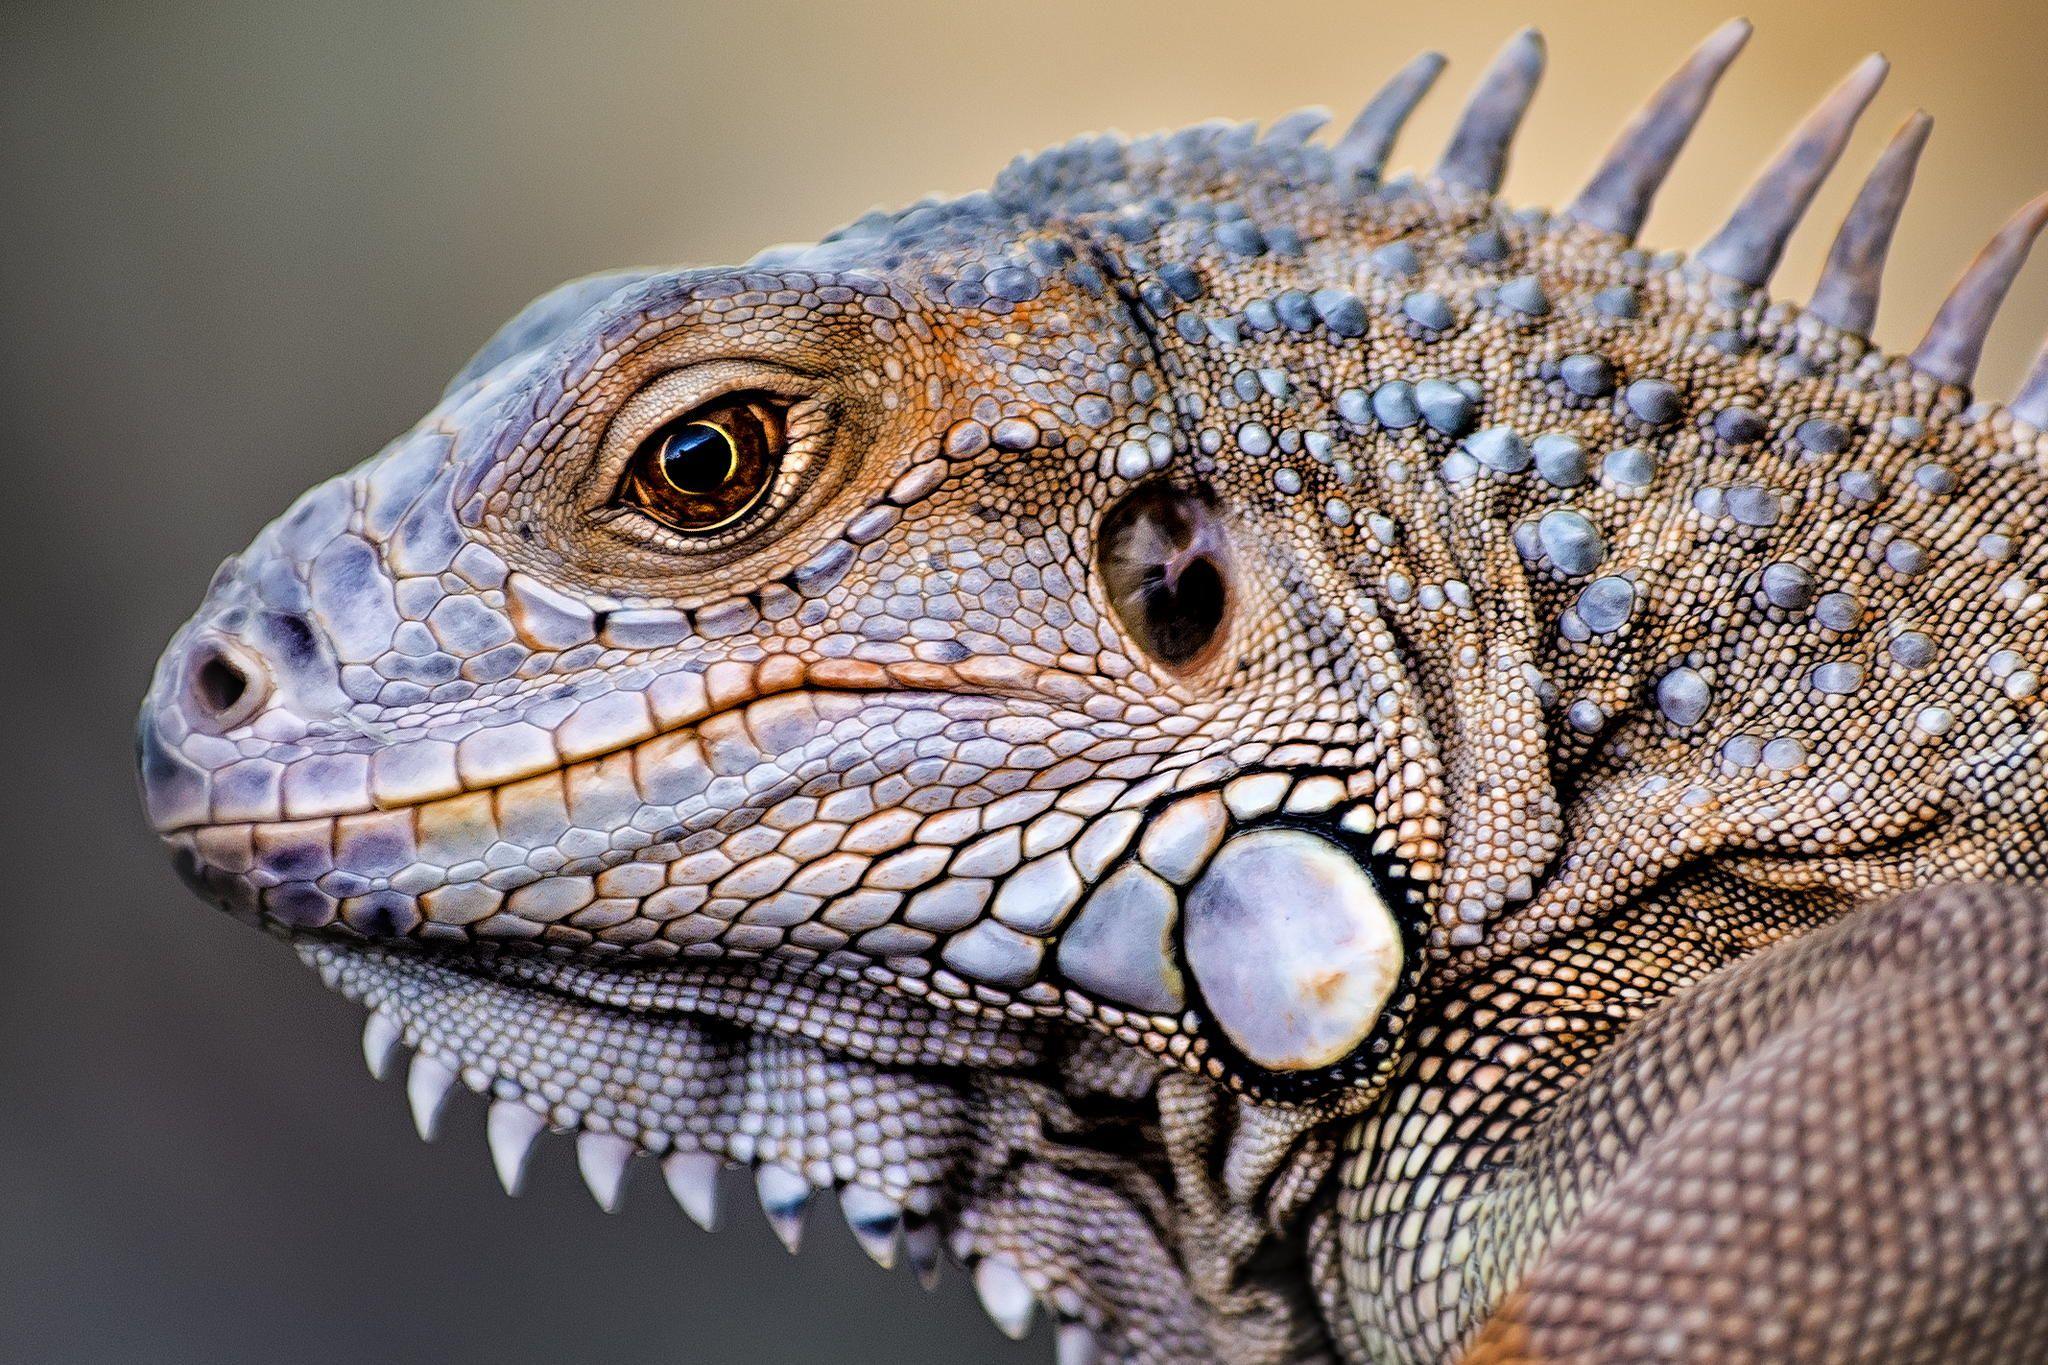 Iguana Is A Genus Of Herbivorous Lizards Native To